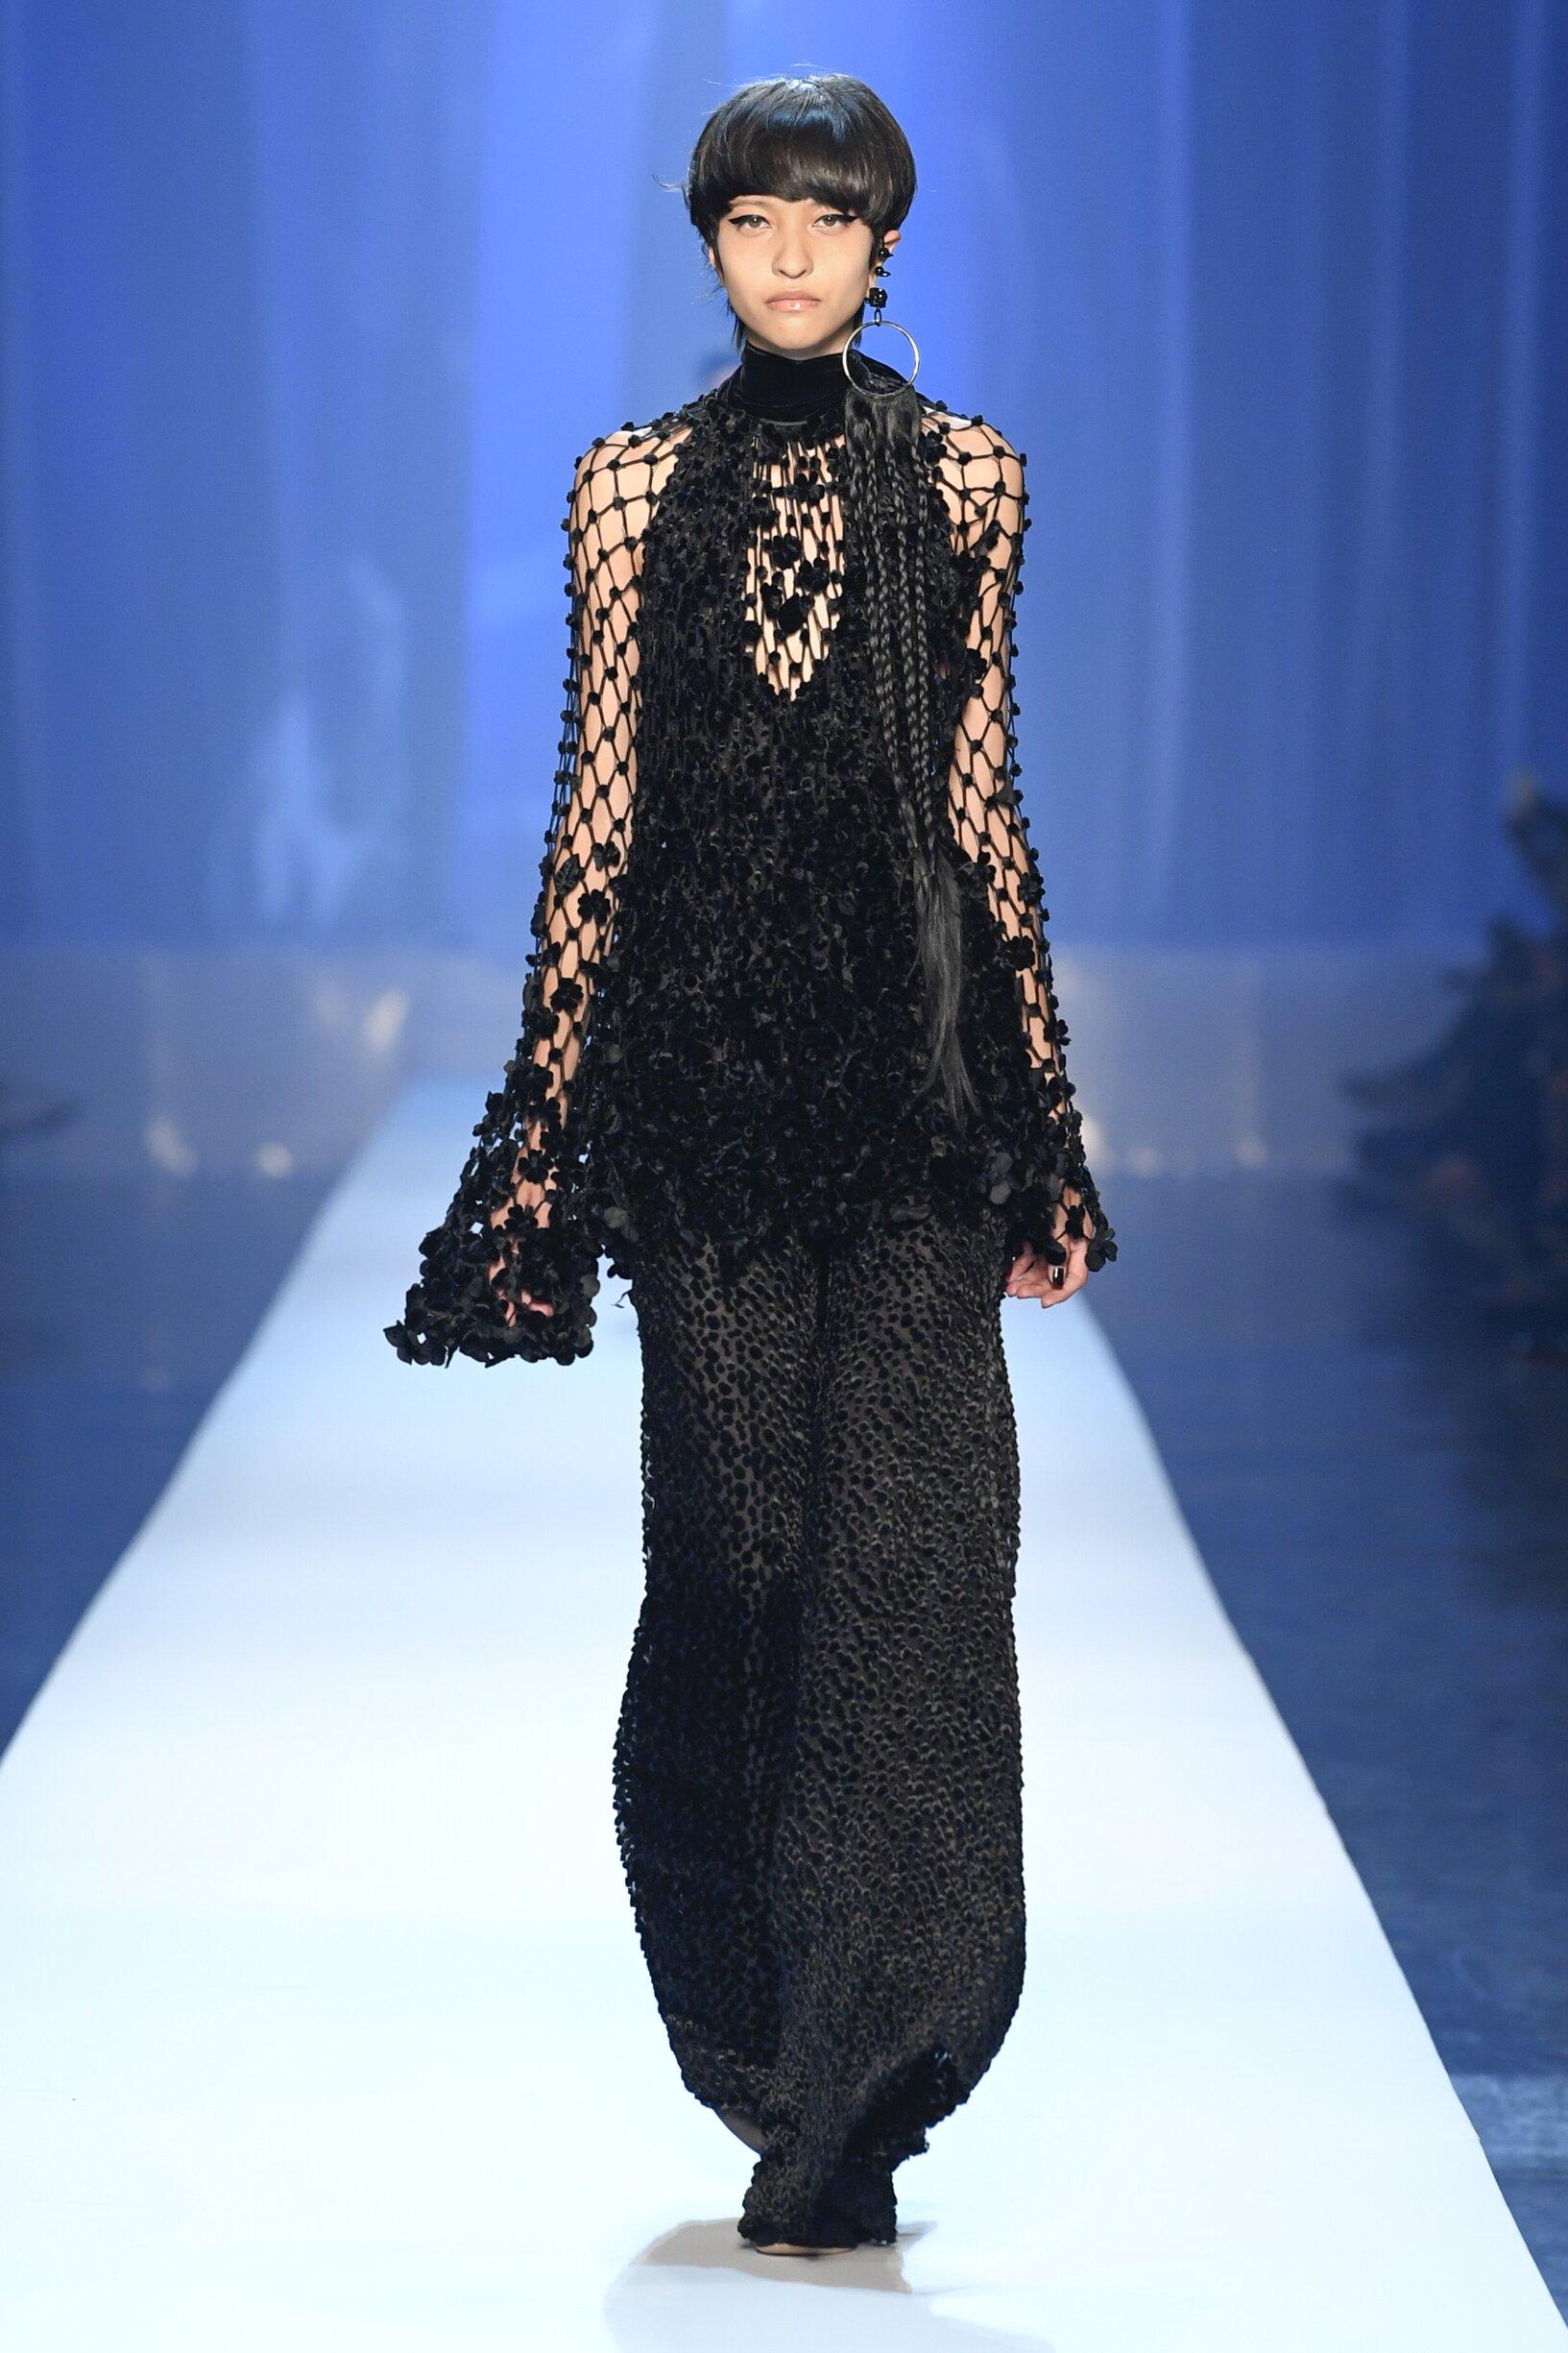 2018 Jean-Paul Gaultier Haute Couture Fall Winter Woman